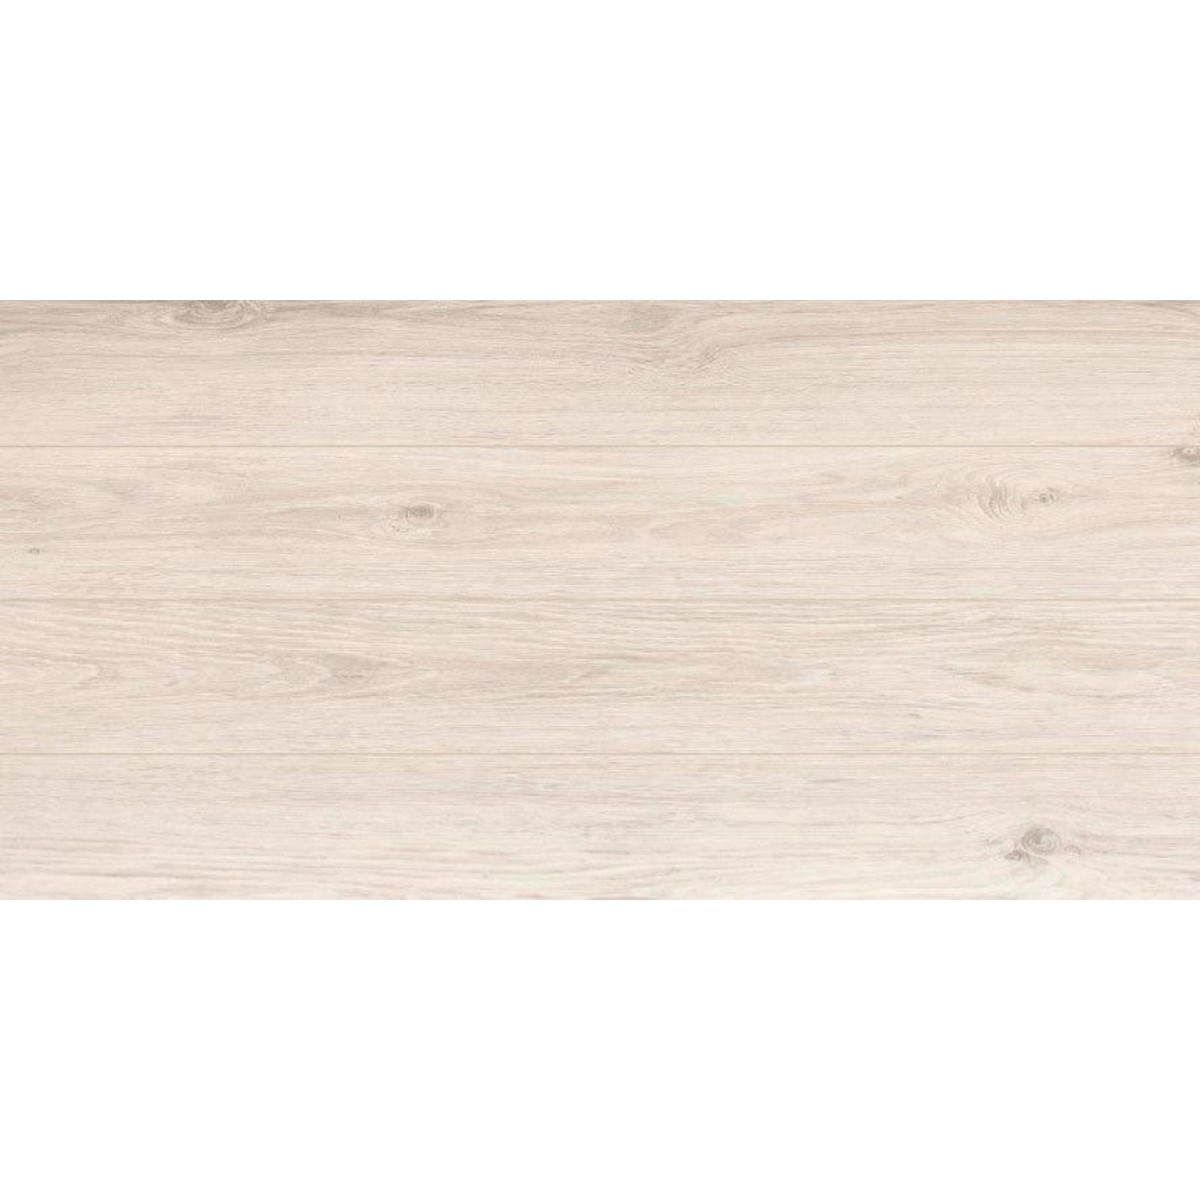 Ламинат Classen Vogue 33 класс толщина 10 мм 1.646 м²